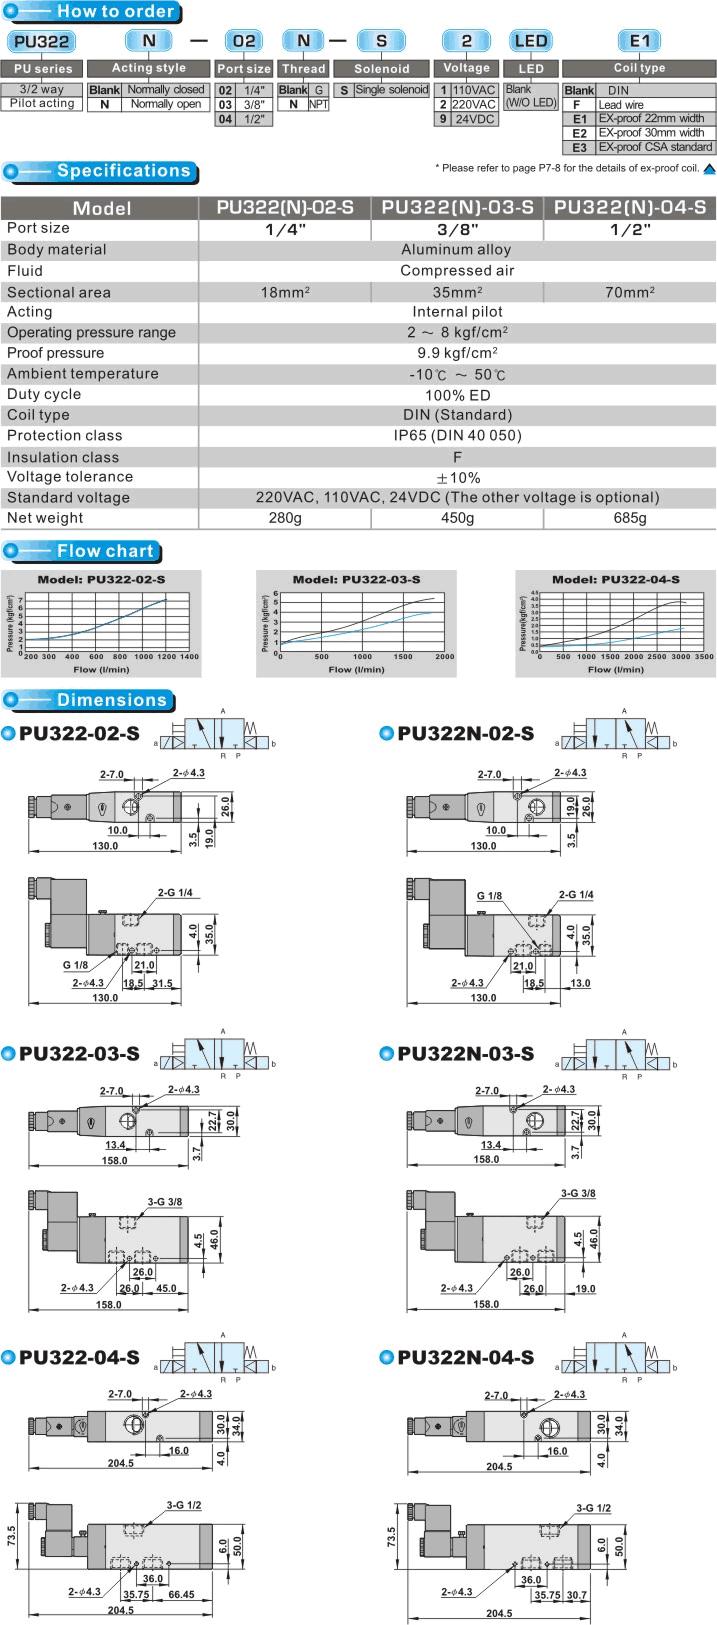 Shako 3 2 Way Pilot Solenoid Valve Pu322n 02 S 03 Wiring Diagram Write A Review